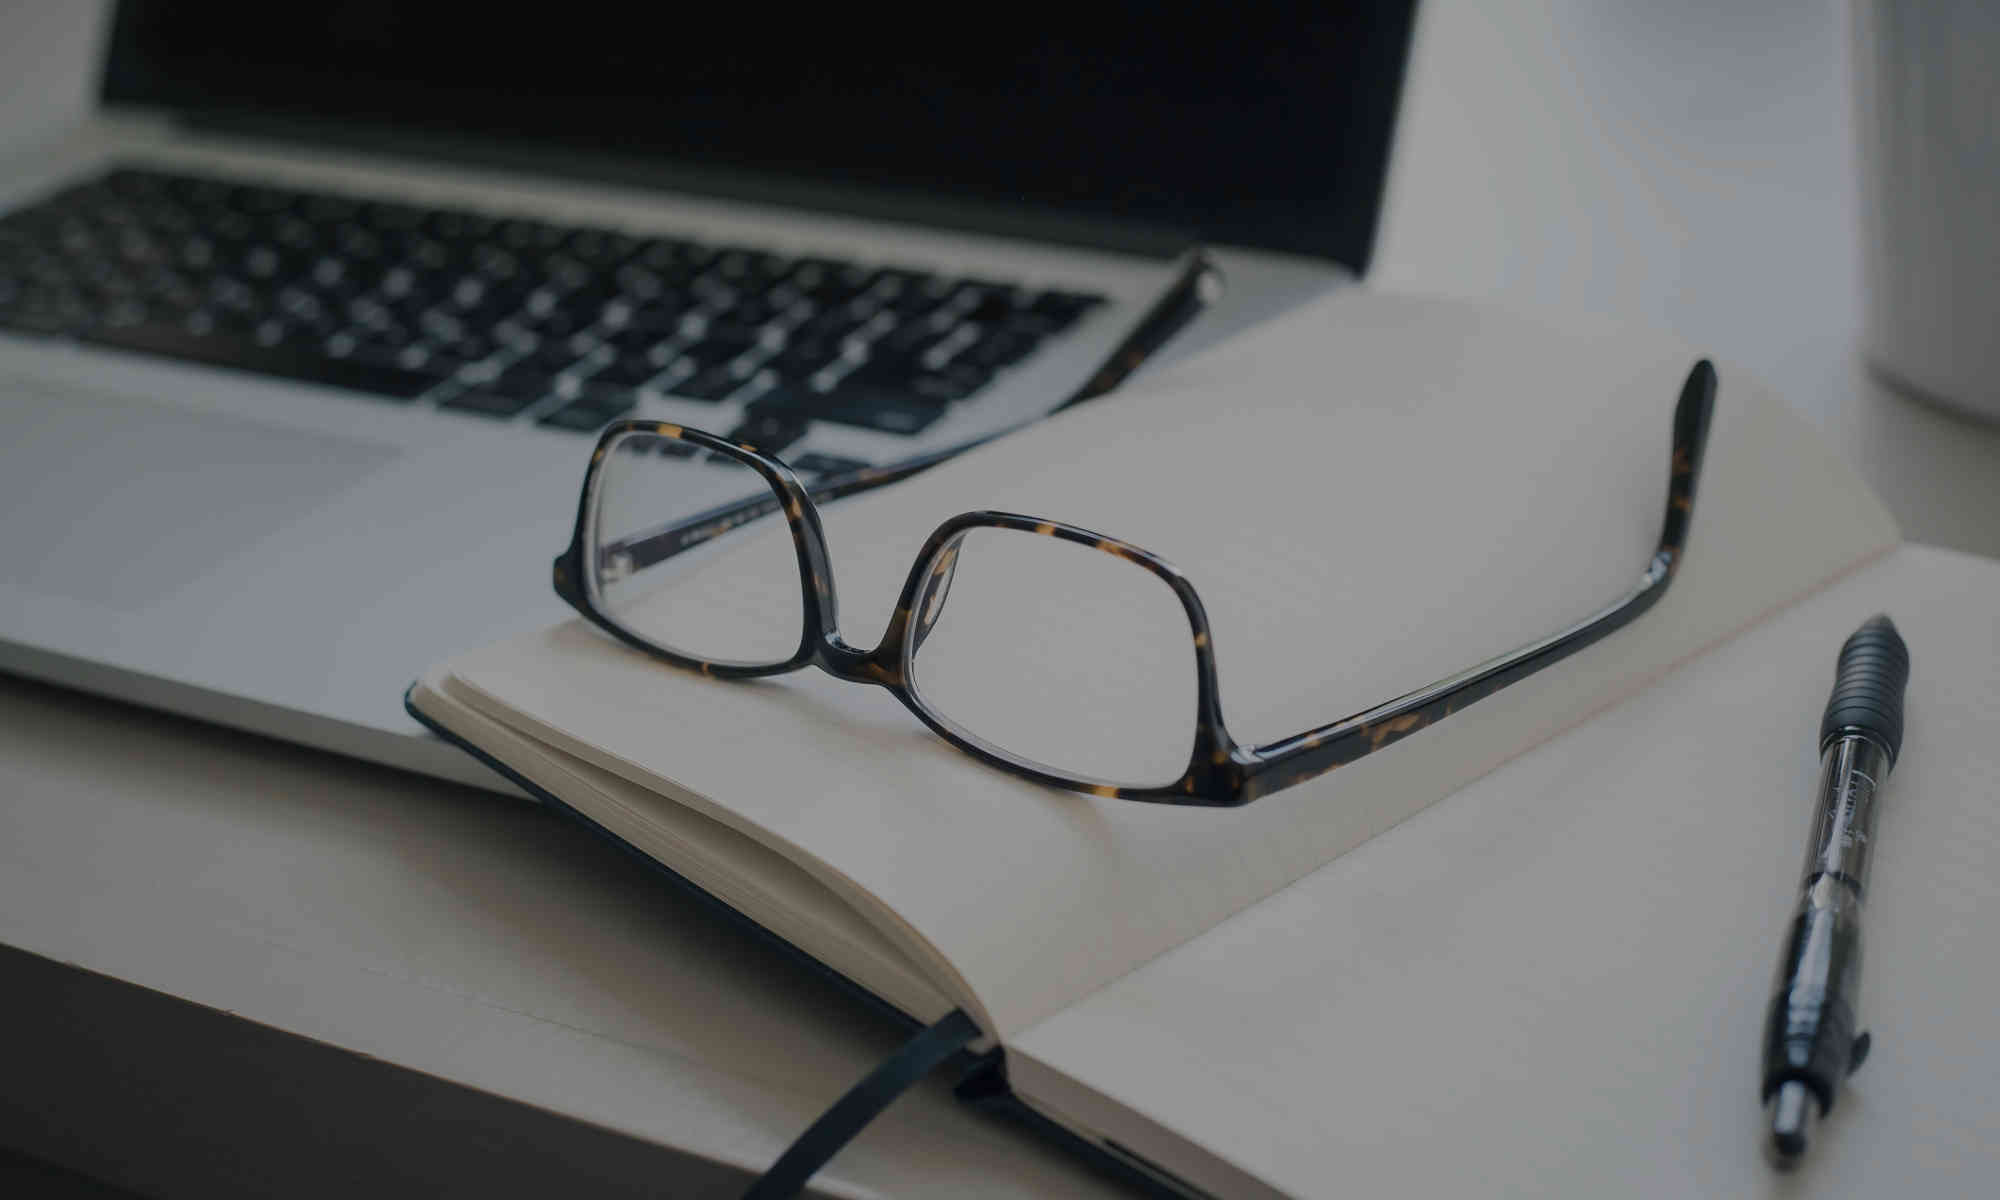 Bogføring i Excel og andre regneark – Se, hvilke krav, der er til bogføringen